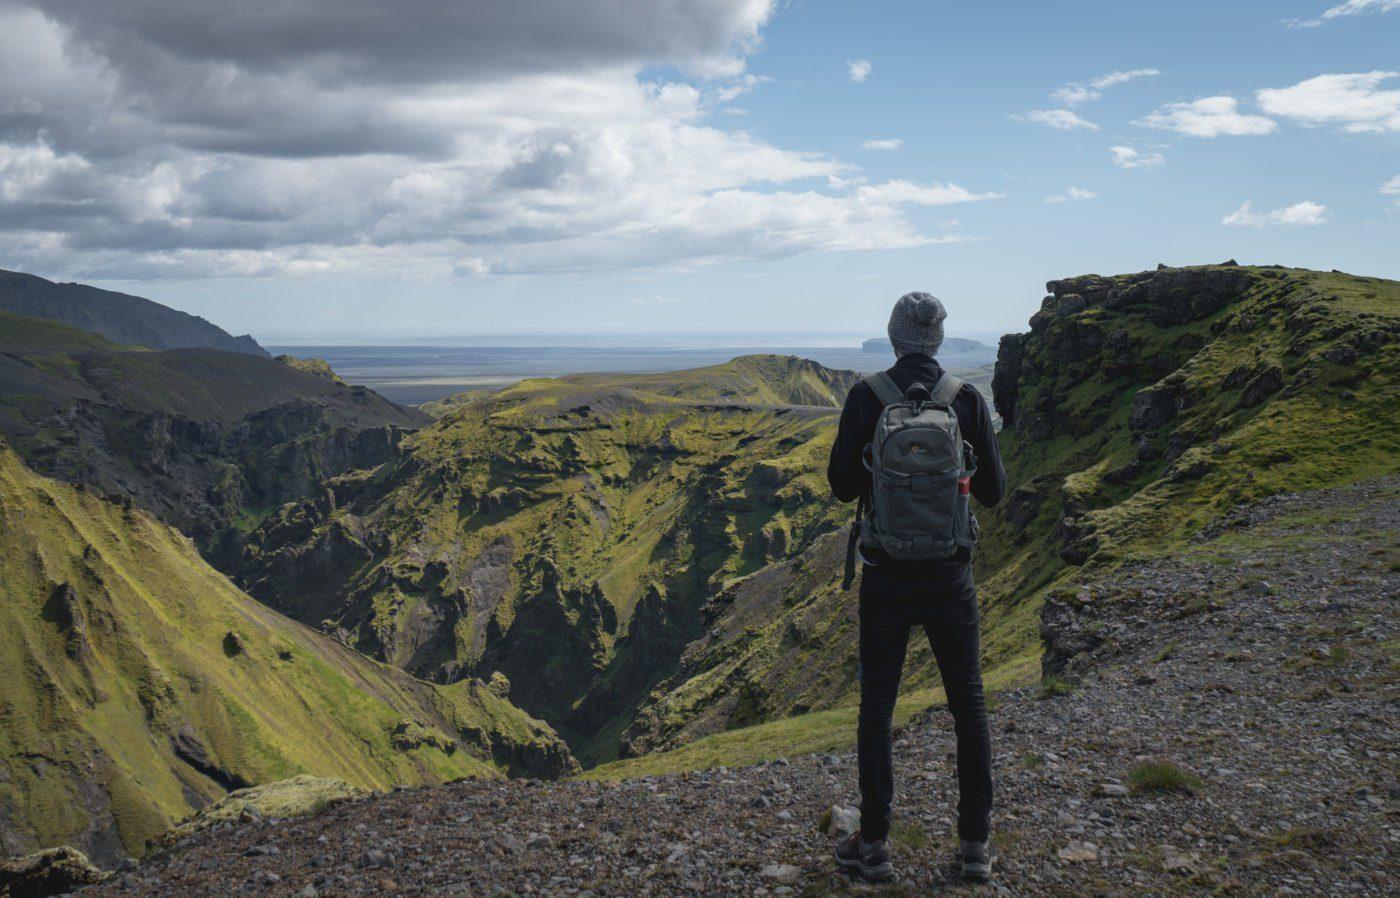 thakgil, number 6 of hidden gems in Iceland